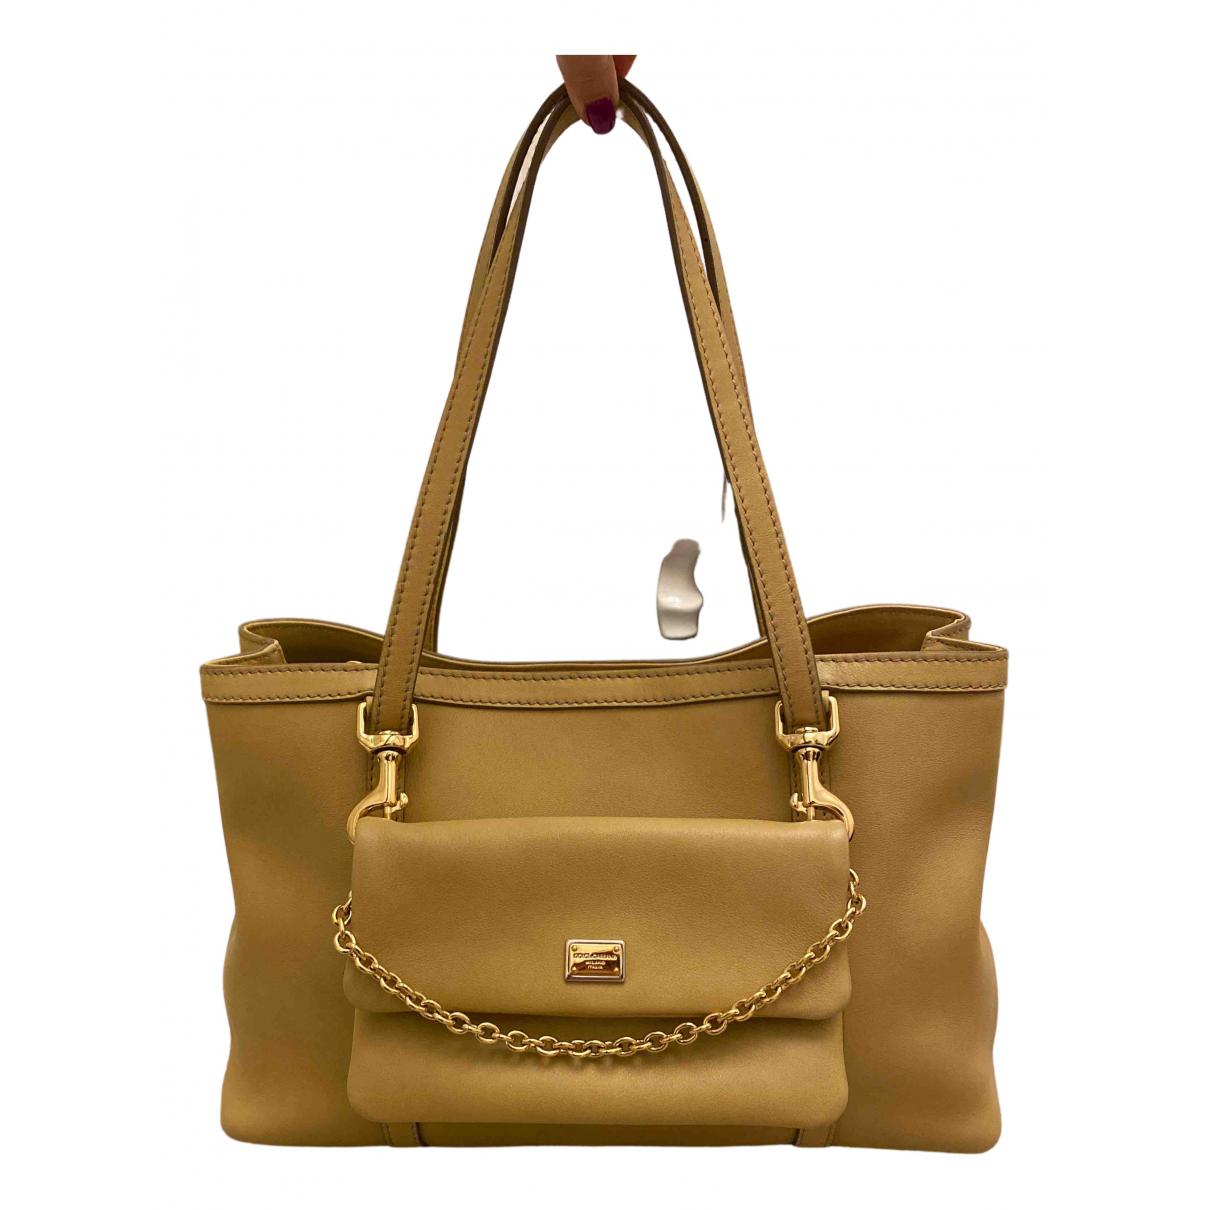 Dolce & Gabbana - Sac a main   pour femme en cuir - camel